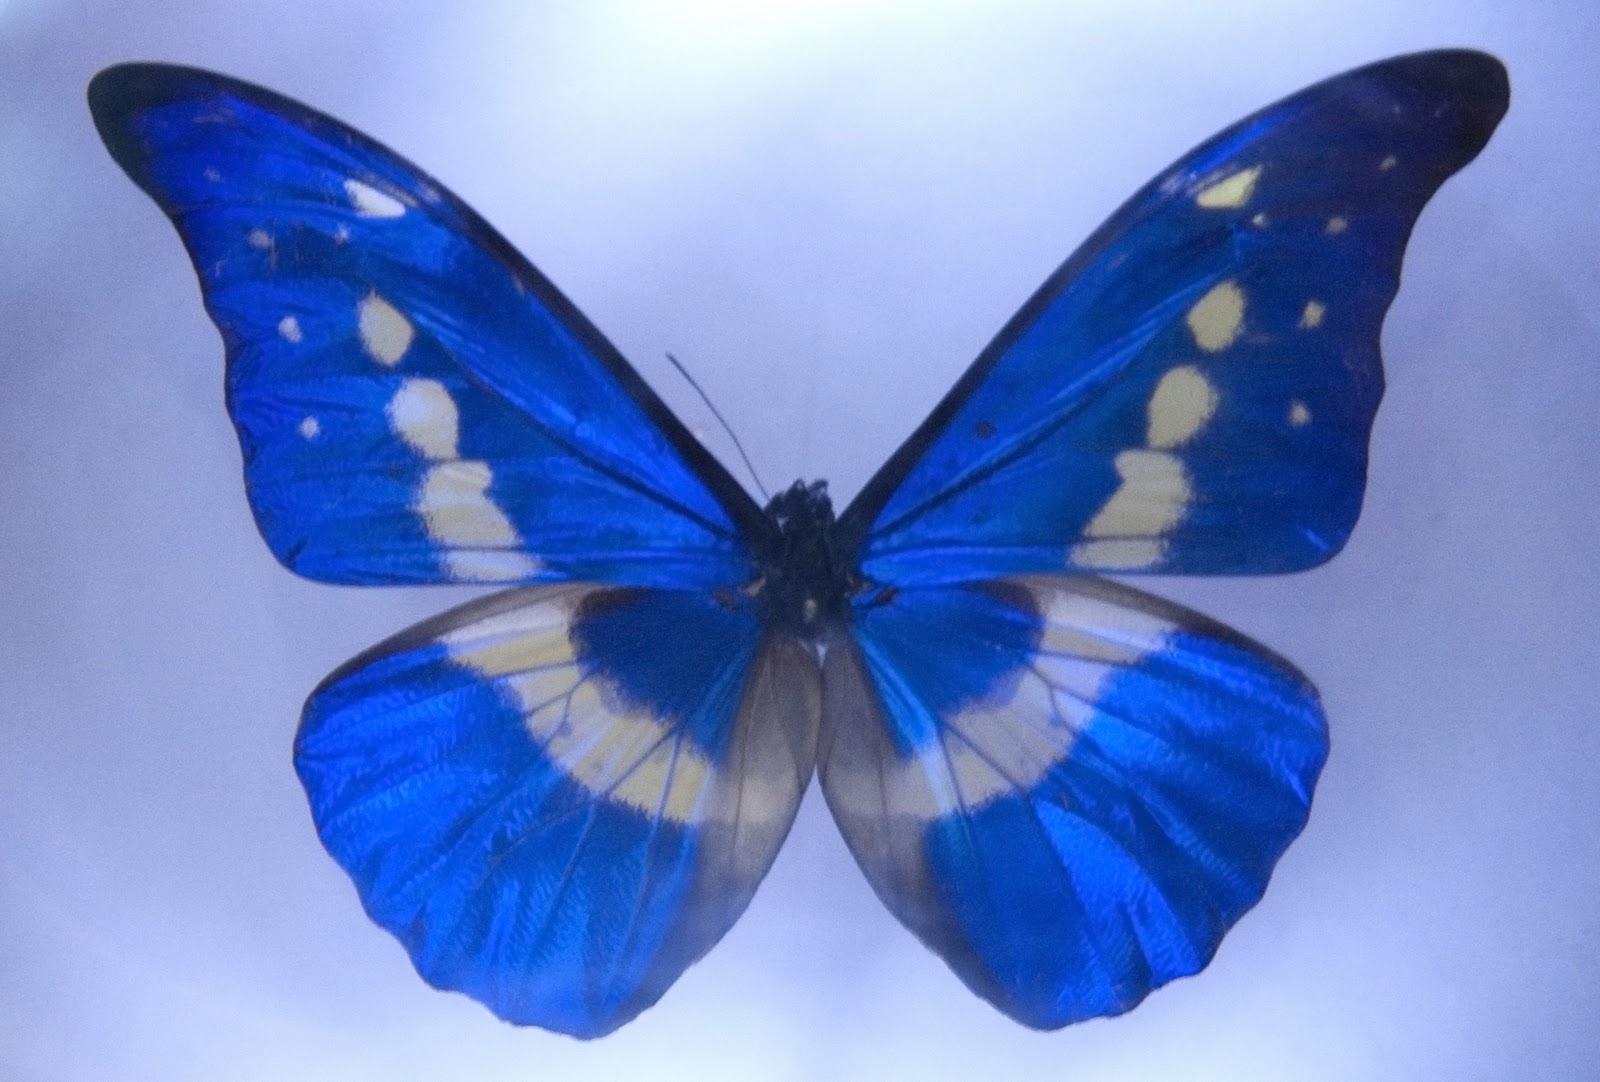 Silhouette Design Symmetry In Nature